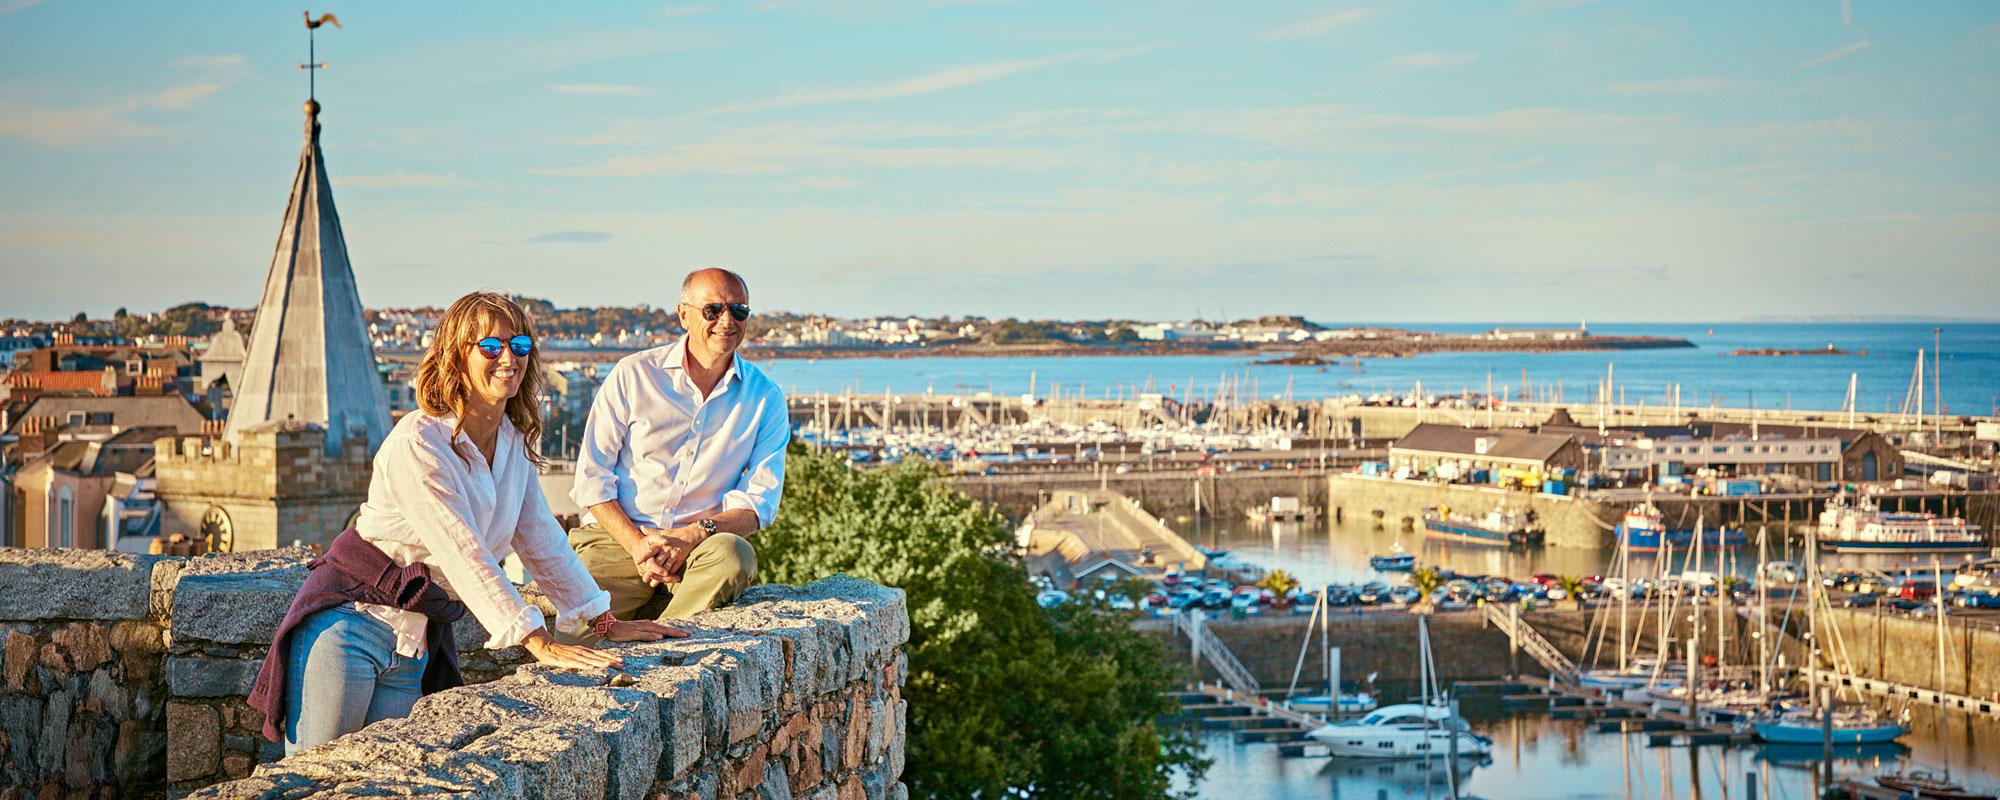 Sarnia Hotels Guernsey